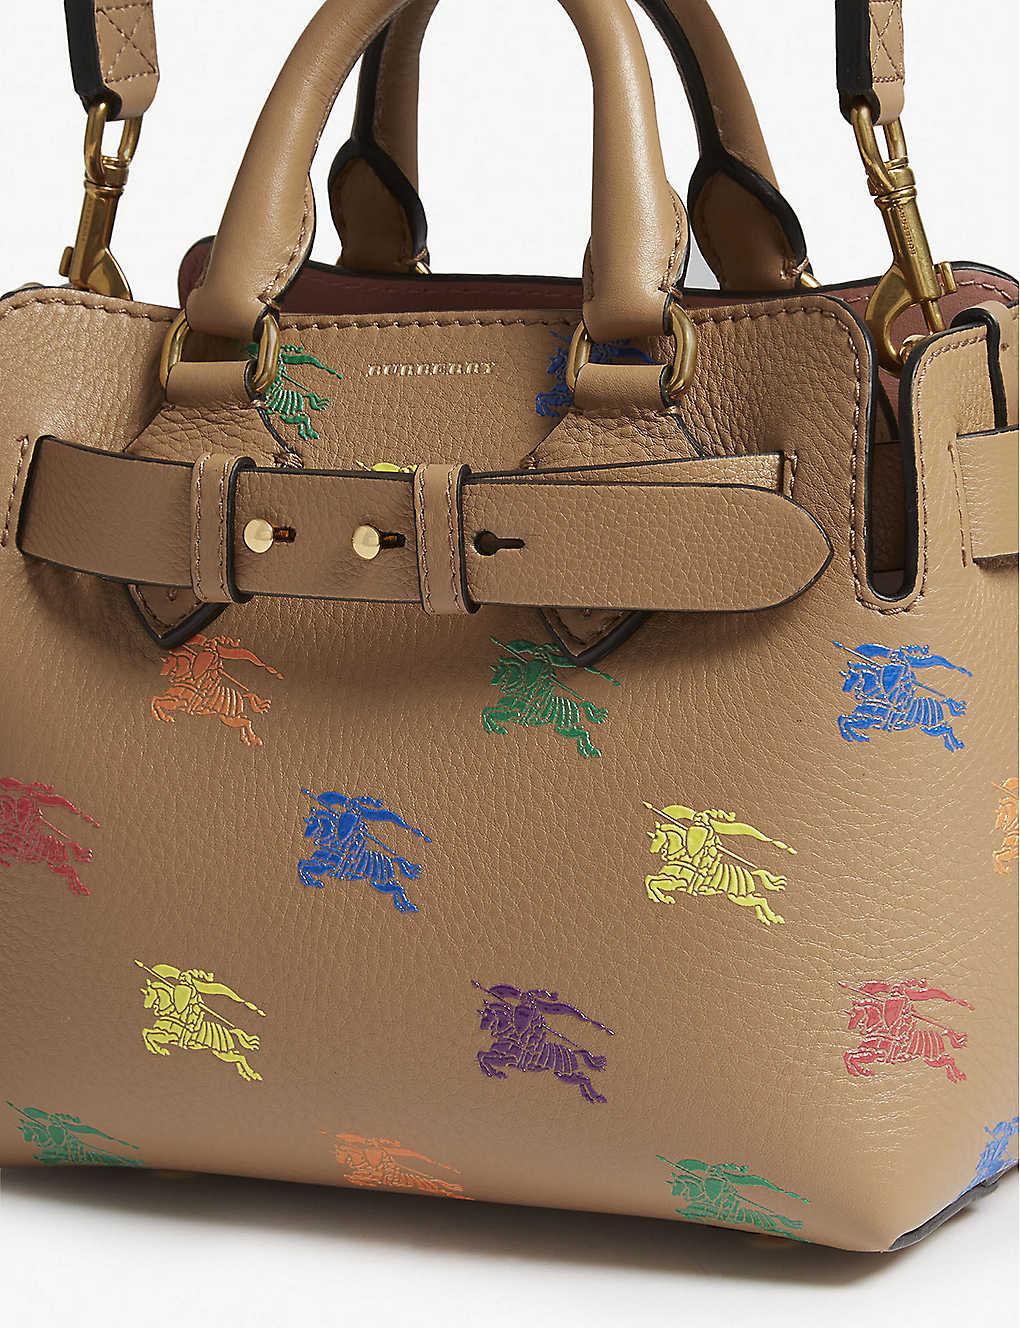 928b7d2fc137 ... Equestrian knight leather belt bag - Camel zoom